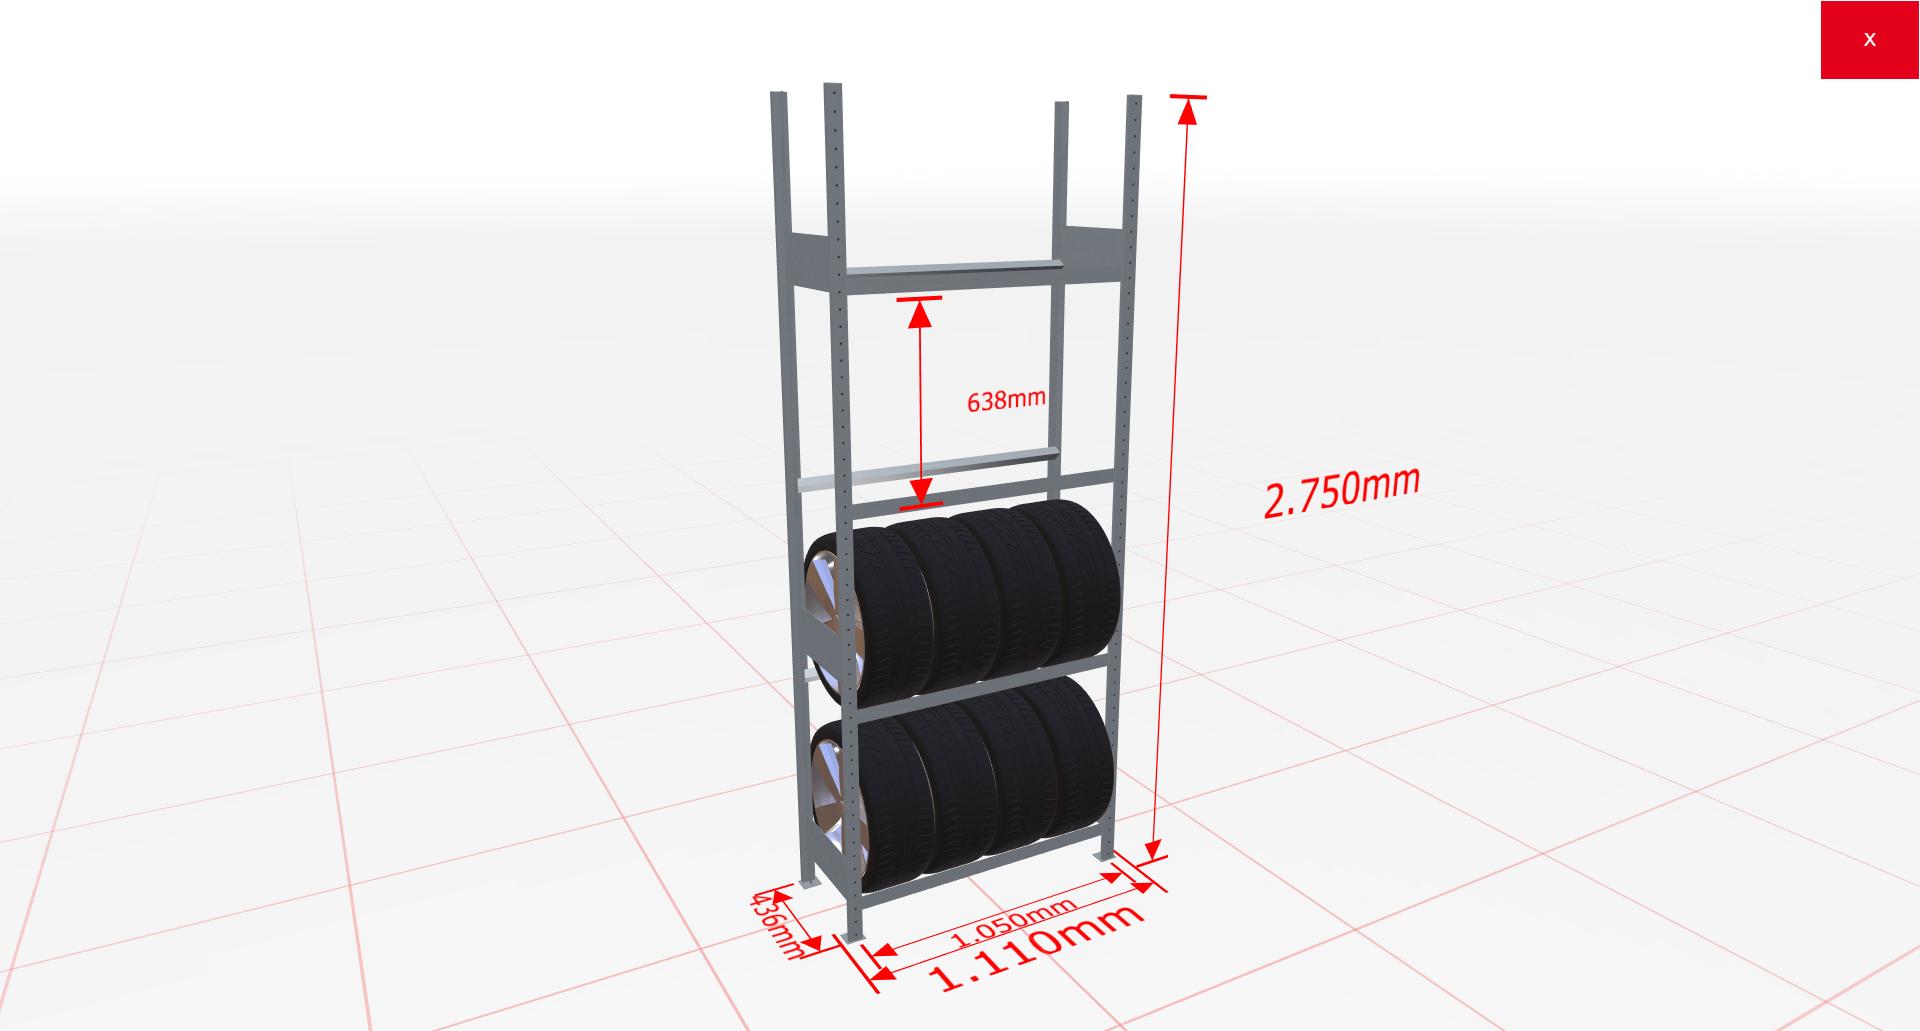 Räderregal Grundregal SCHULTE Lagertechnik 2750x1050x400 mm – 4 Ebenen á 1050 mm, verzinkt